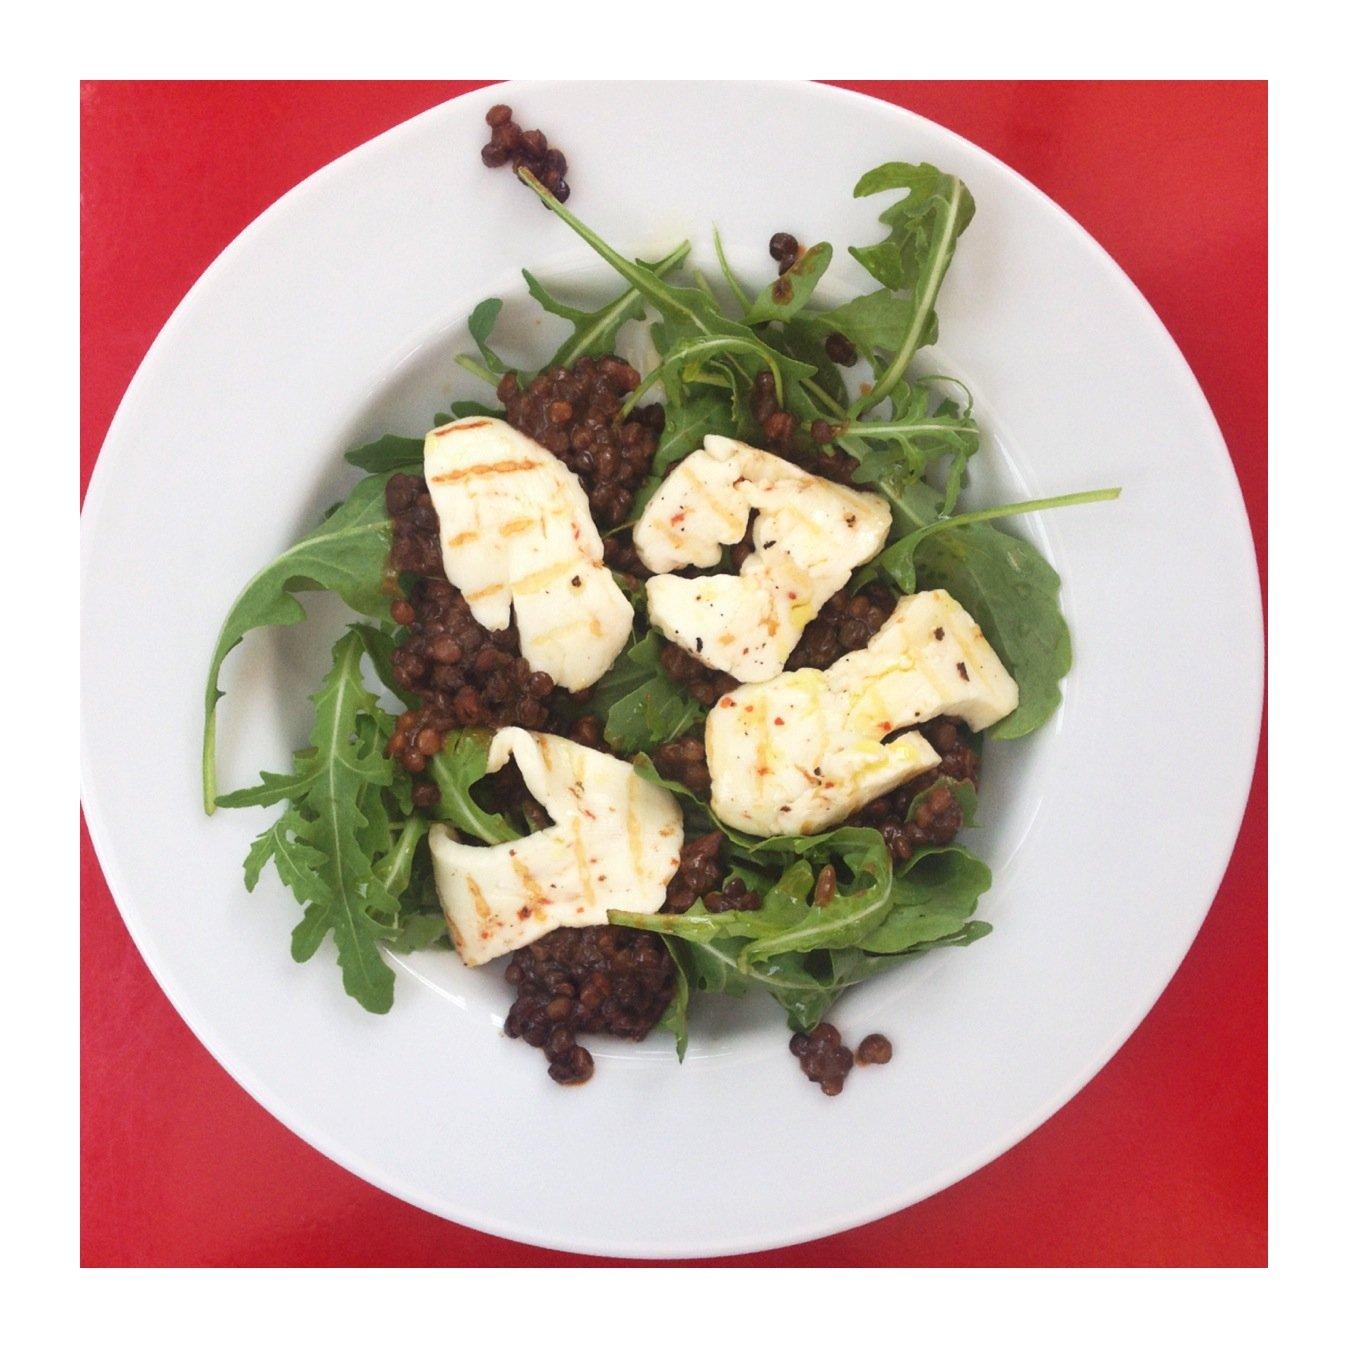 Halloumi and lentil salad